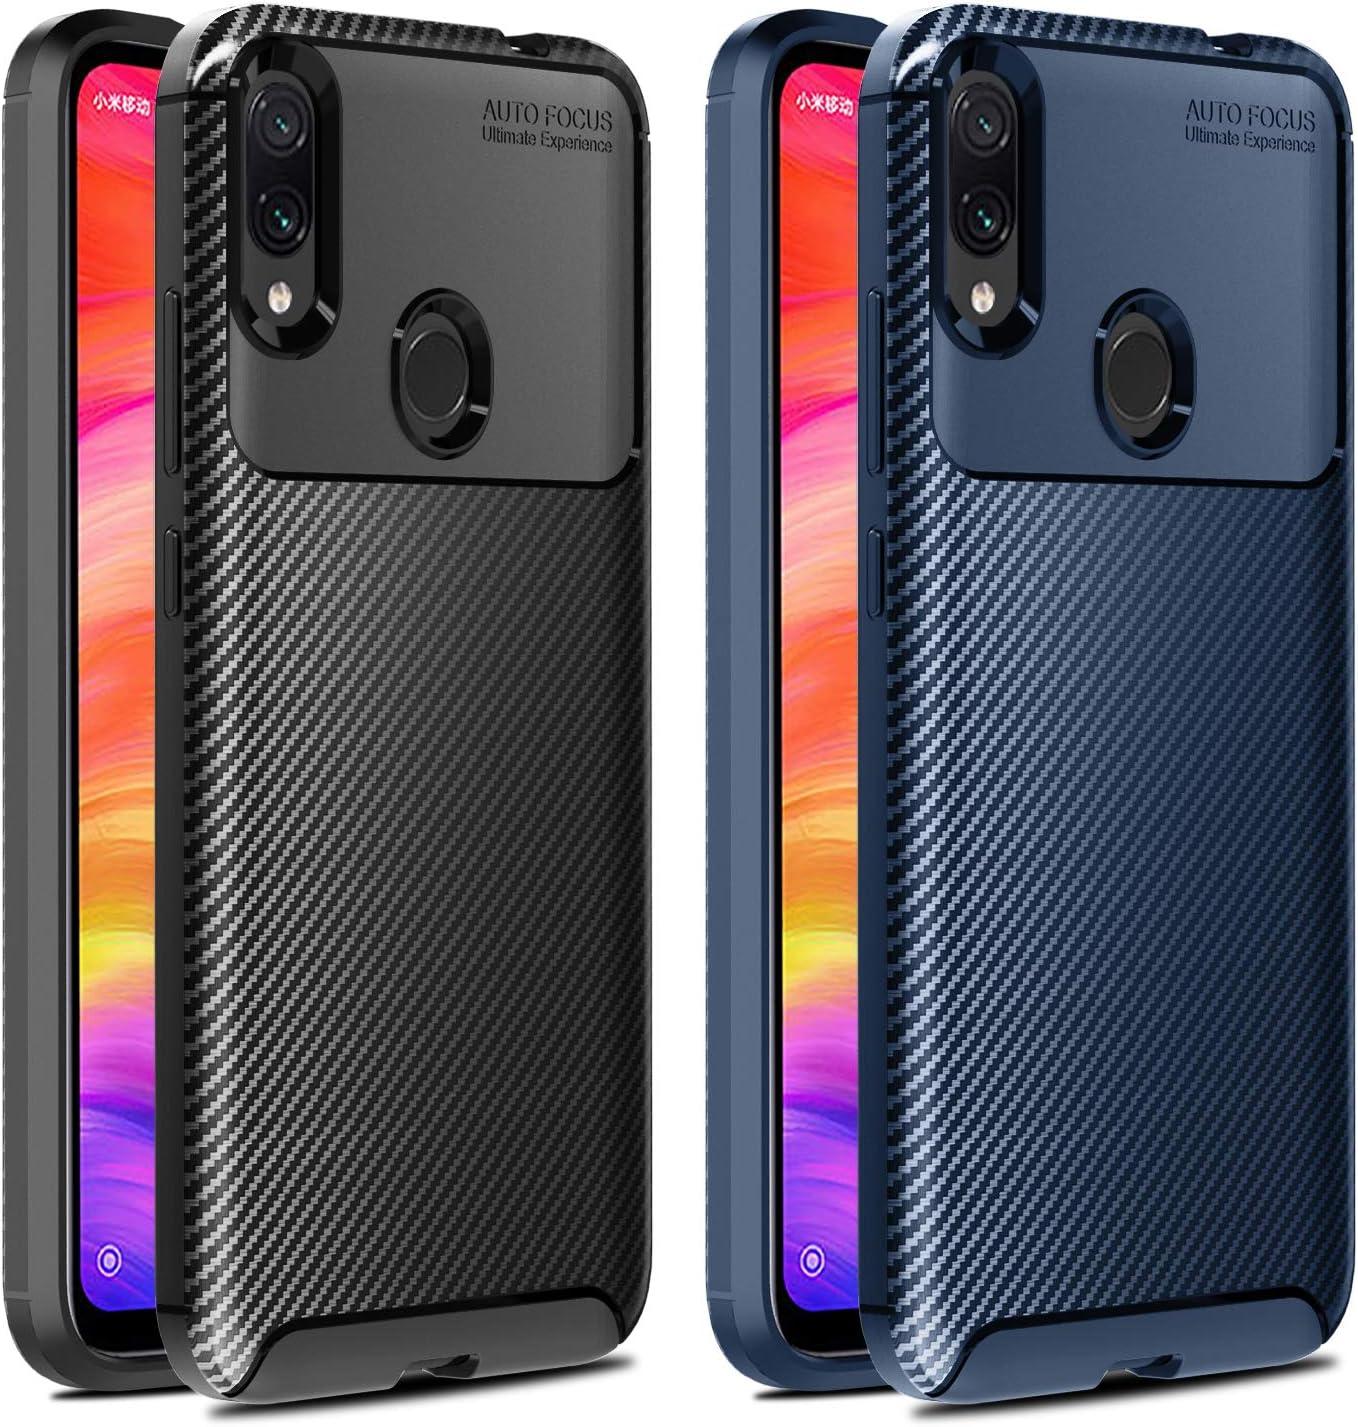 VGUARD [2 Unidades] Funda para Xiaomi Redmi Note 7 / Redmi Note 7 Pro, [Fibra de Carbono] Carcasa Ligera Silicona Suave TPU Gel Bumper Caso Case Cover con Shock- Absorción (Negro+Azul)